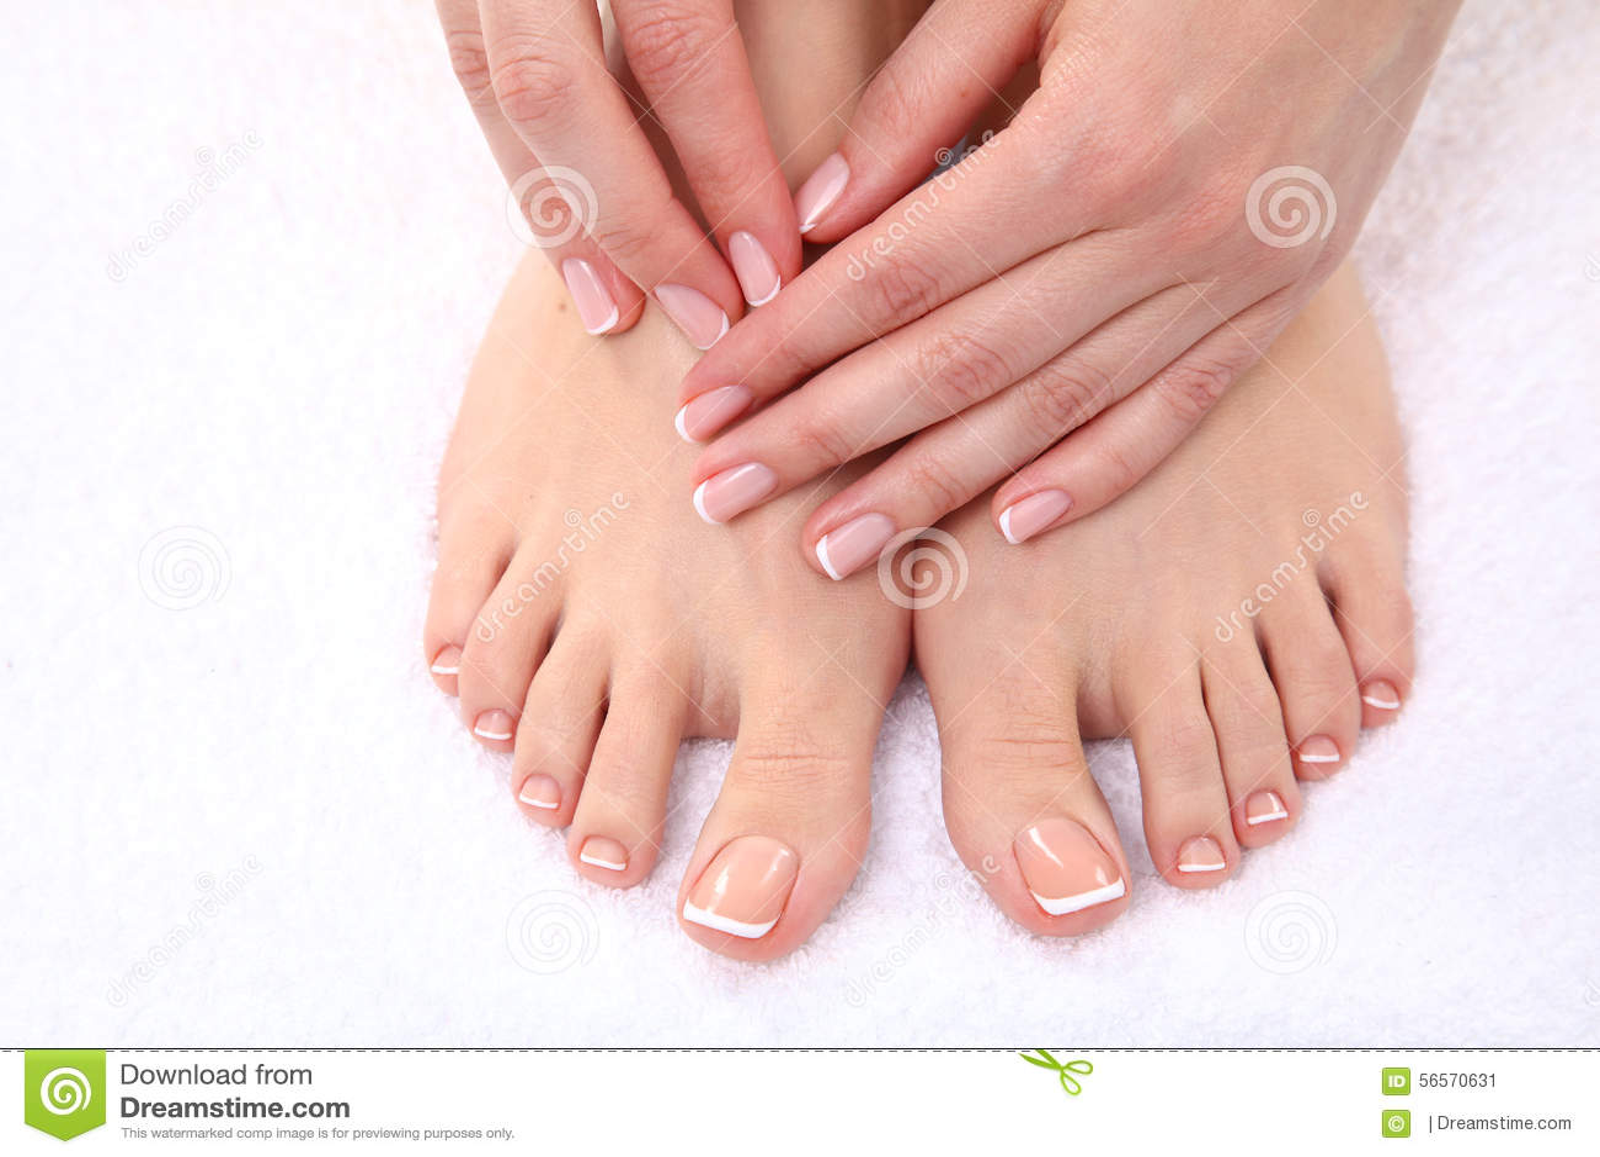 Download Όμορφα πόδια με το τέλειο γαλλικό καρφί SPA Στοκ Εικόνα - εικόνα από γαλλικά, κρέμα: 56570631